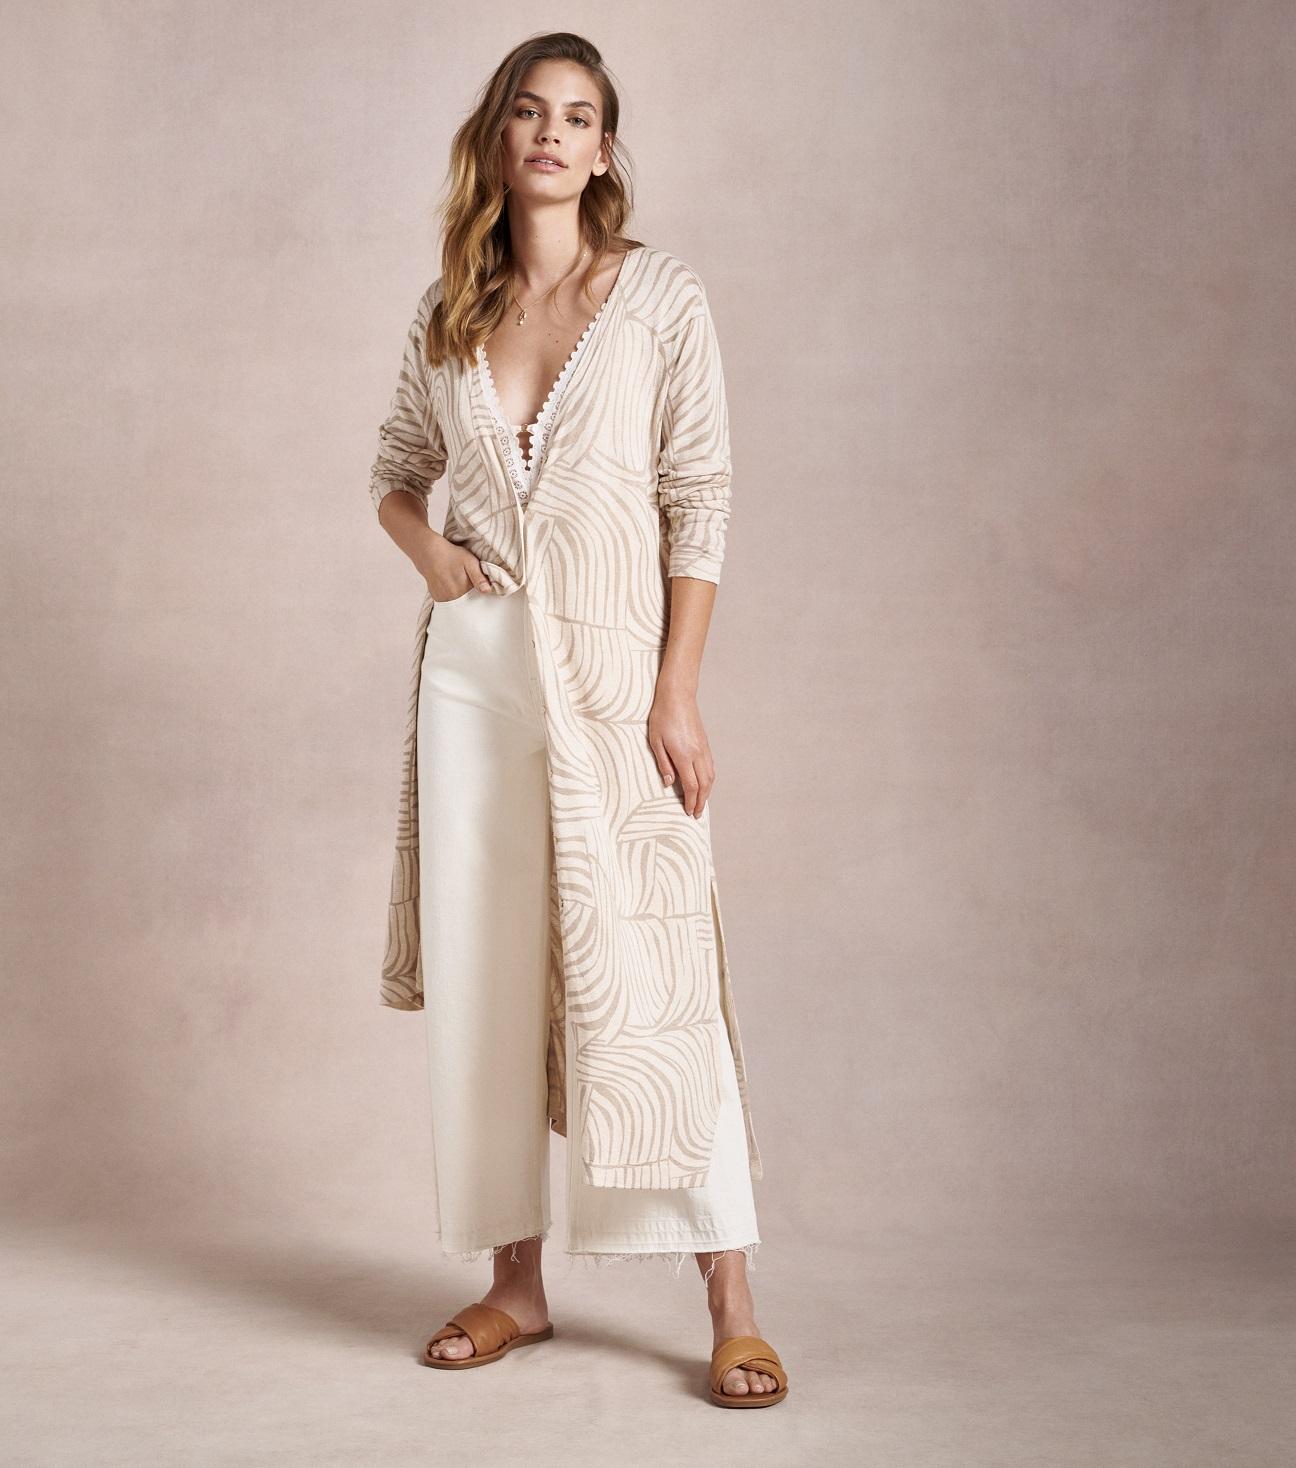 High Summer! Mία συλλογή ρούχων που υποδέχεται το καλοκαίρι όπως του αξίζει